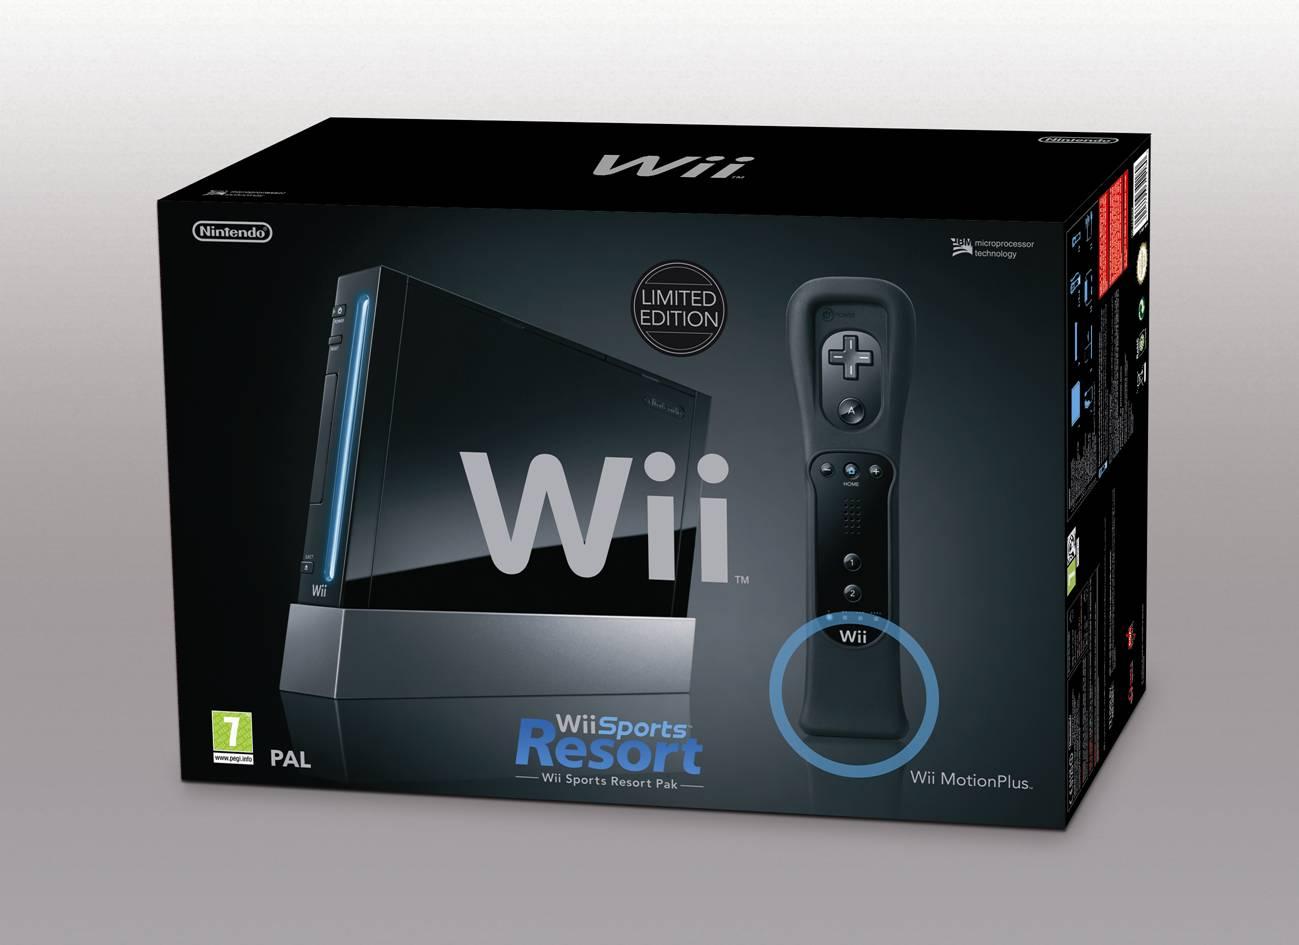 Roxas in the black world tipos de consolas de videojuegos for Consola de tipo industrial